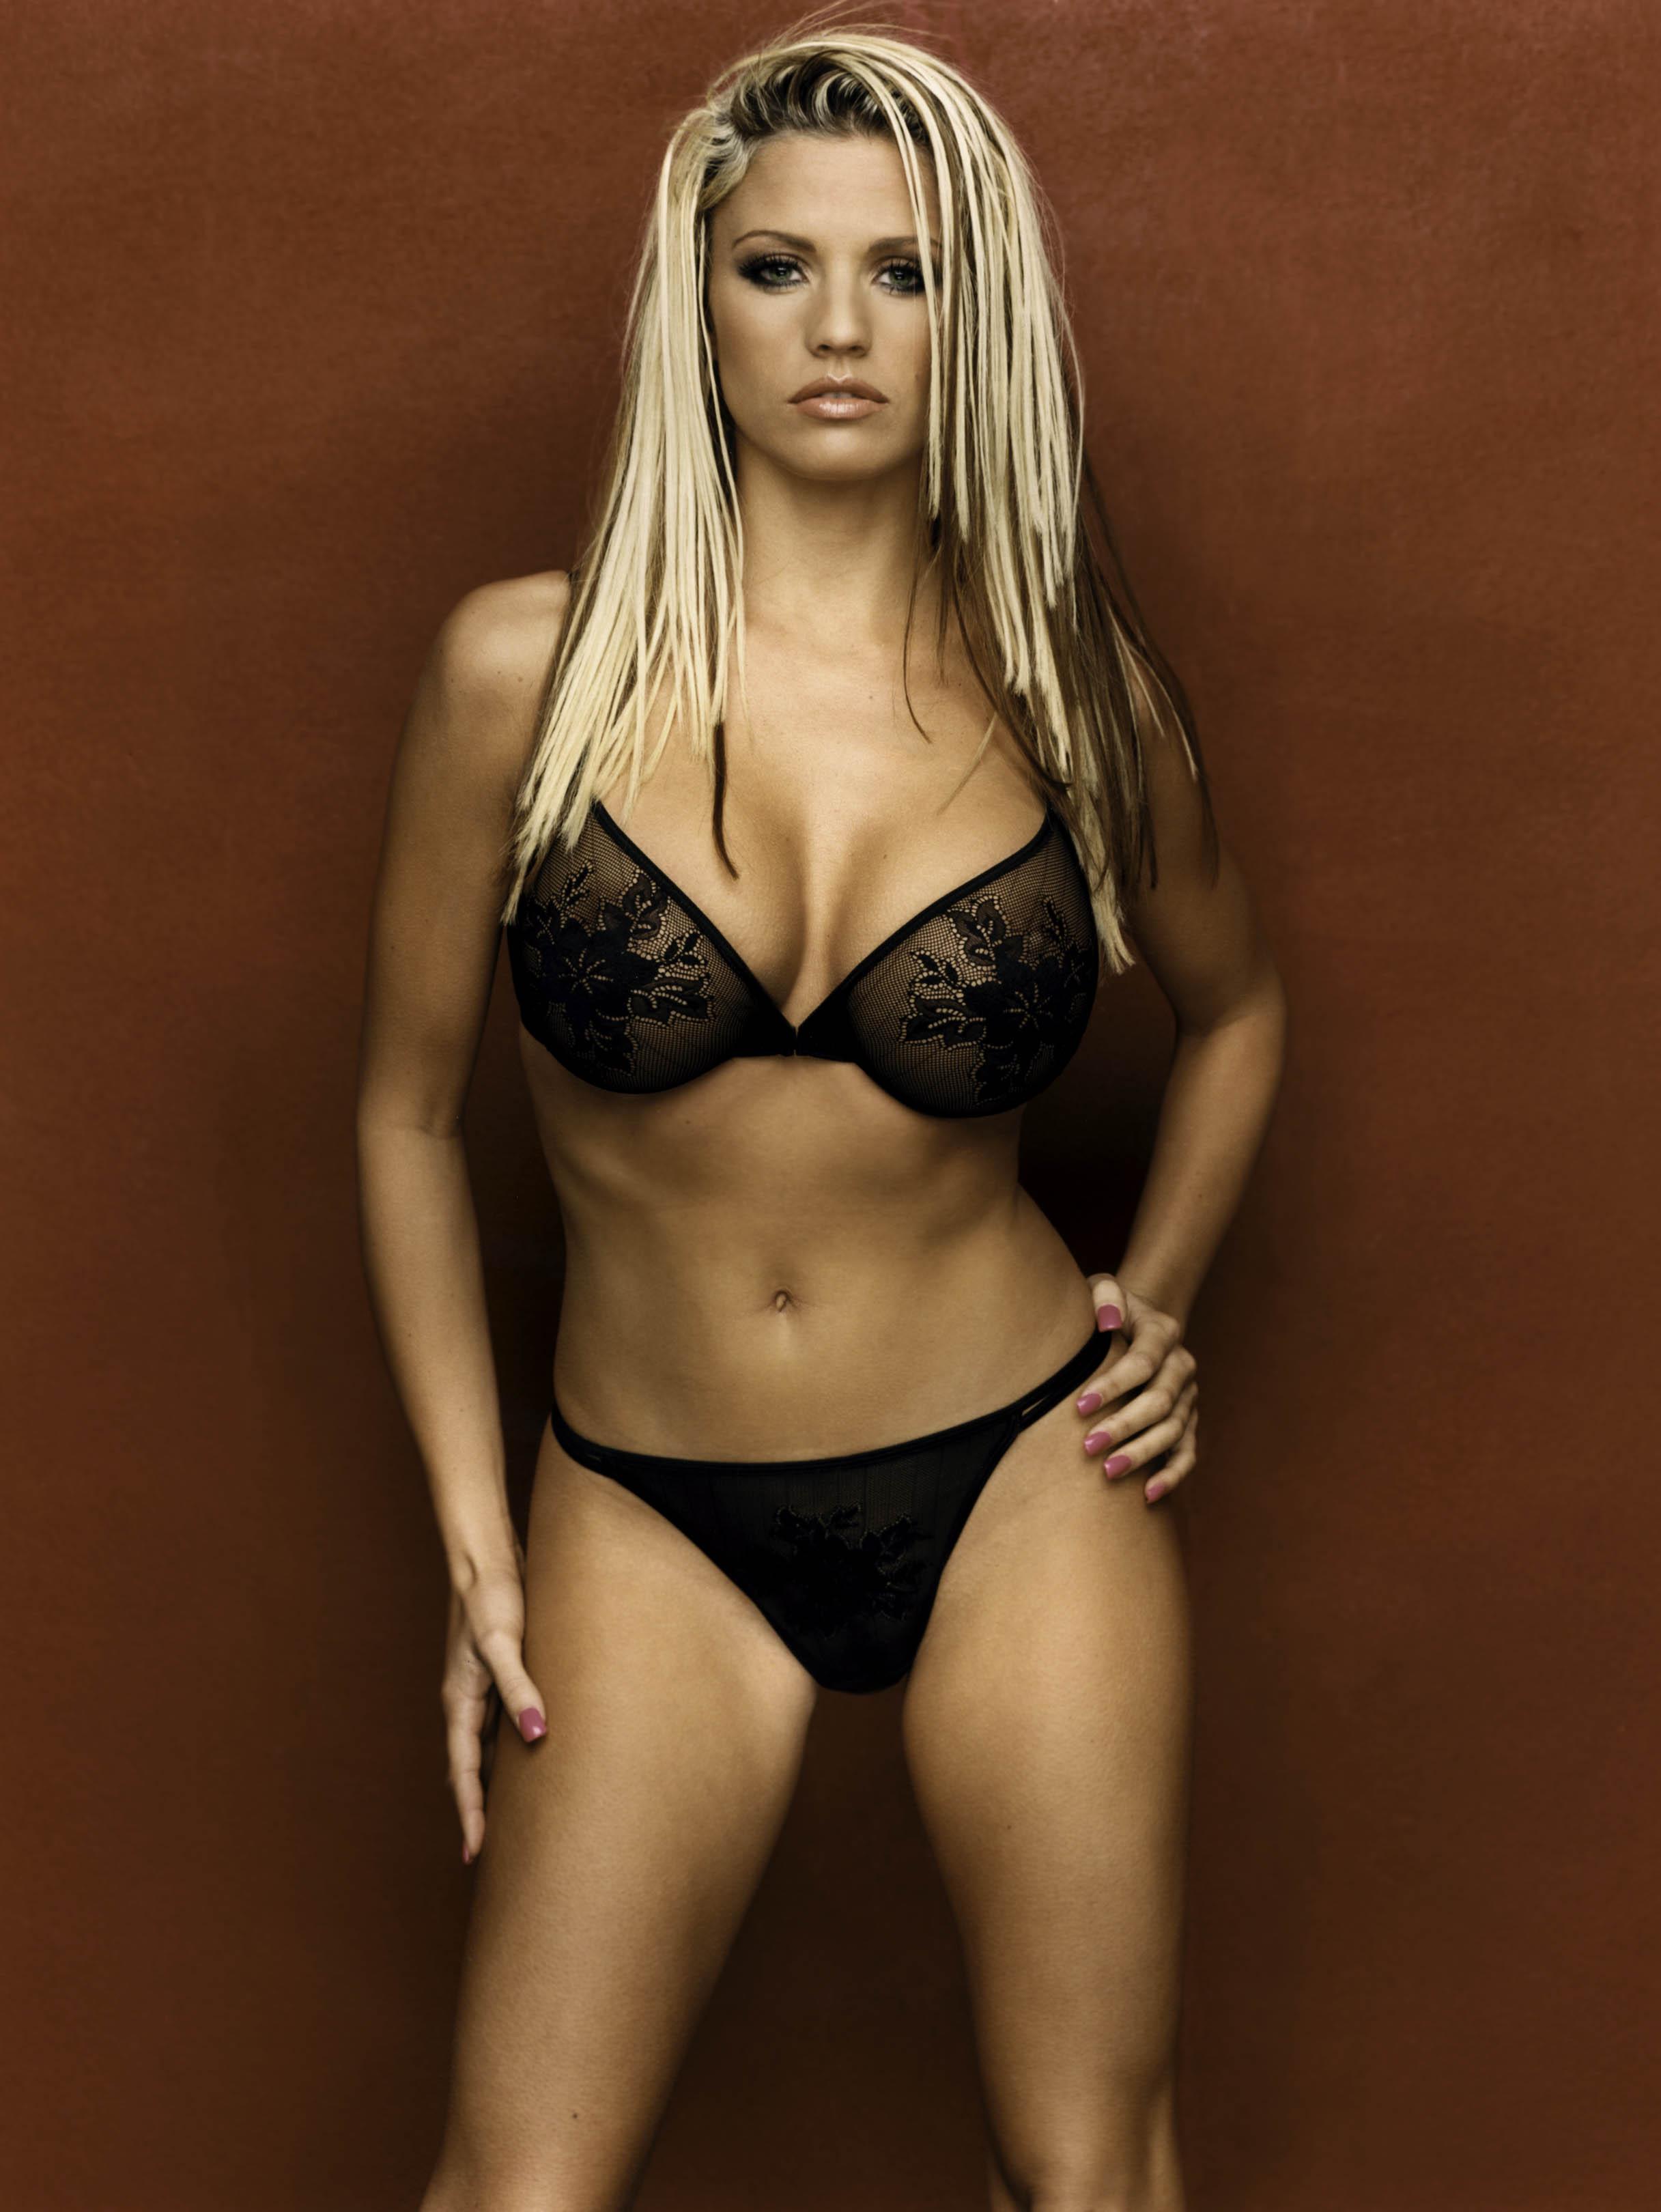 Katie jordan price nuda